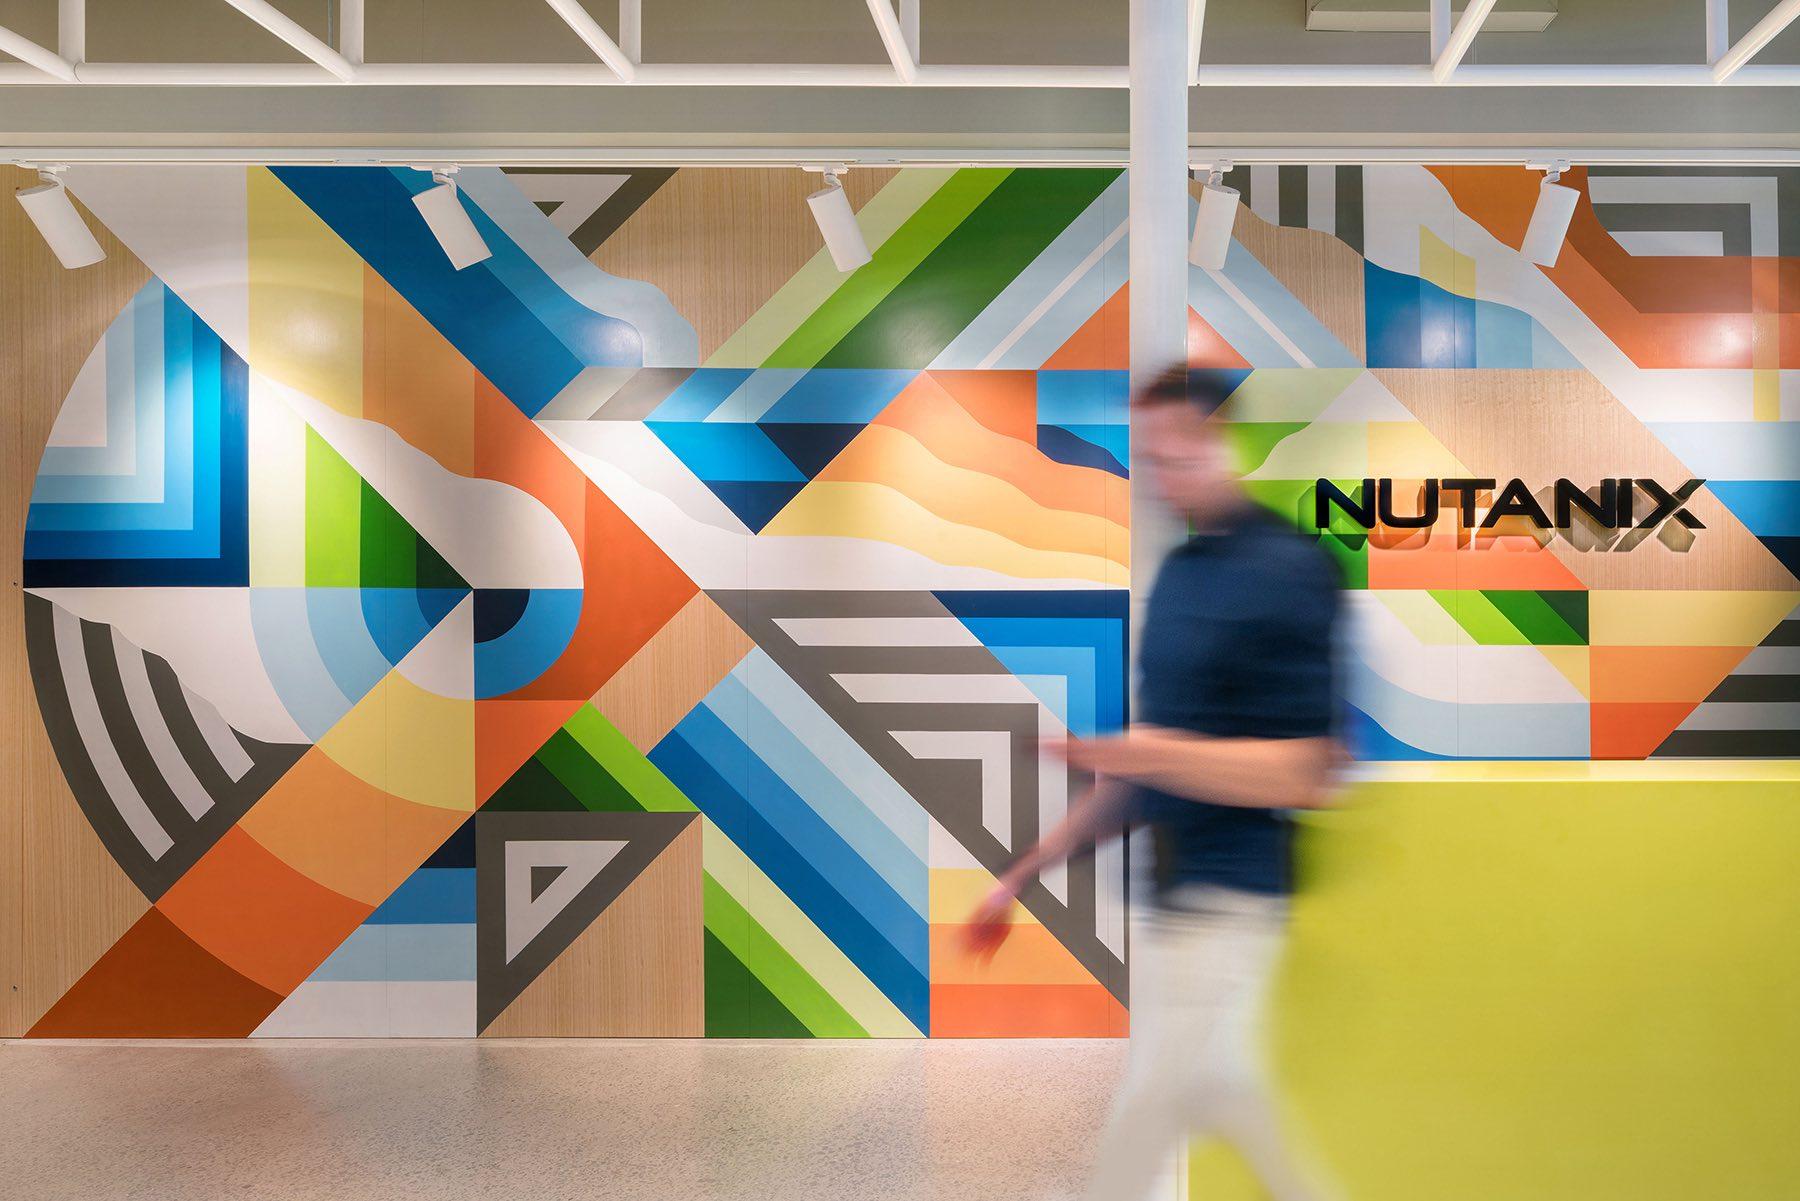 nutanix-sydney-office-9